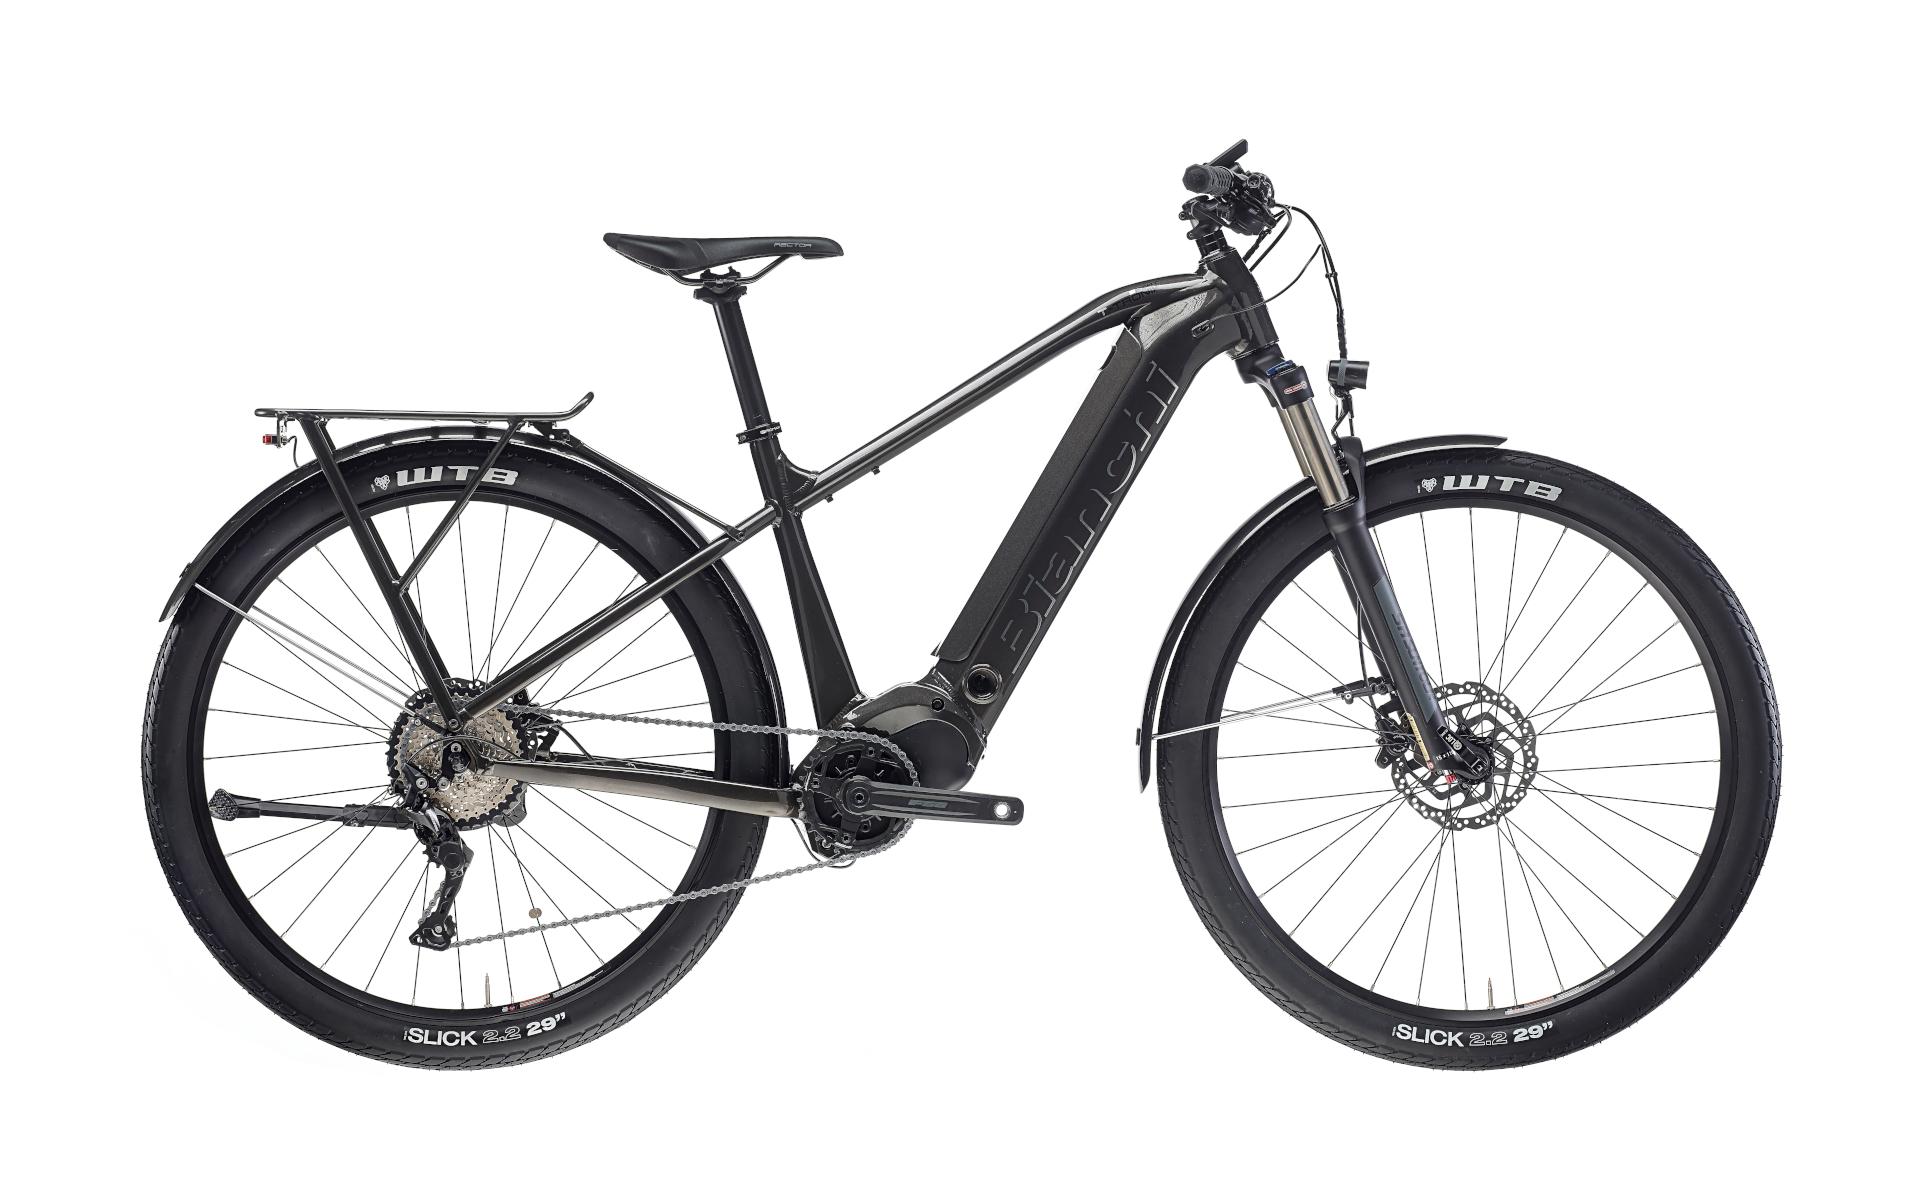 bianchi black electric city hybrid bike